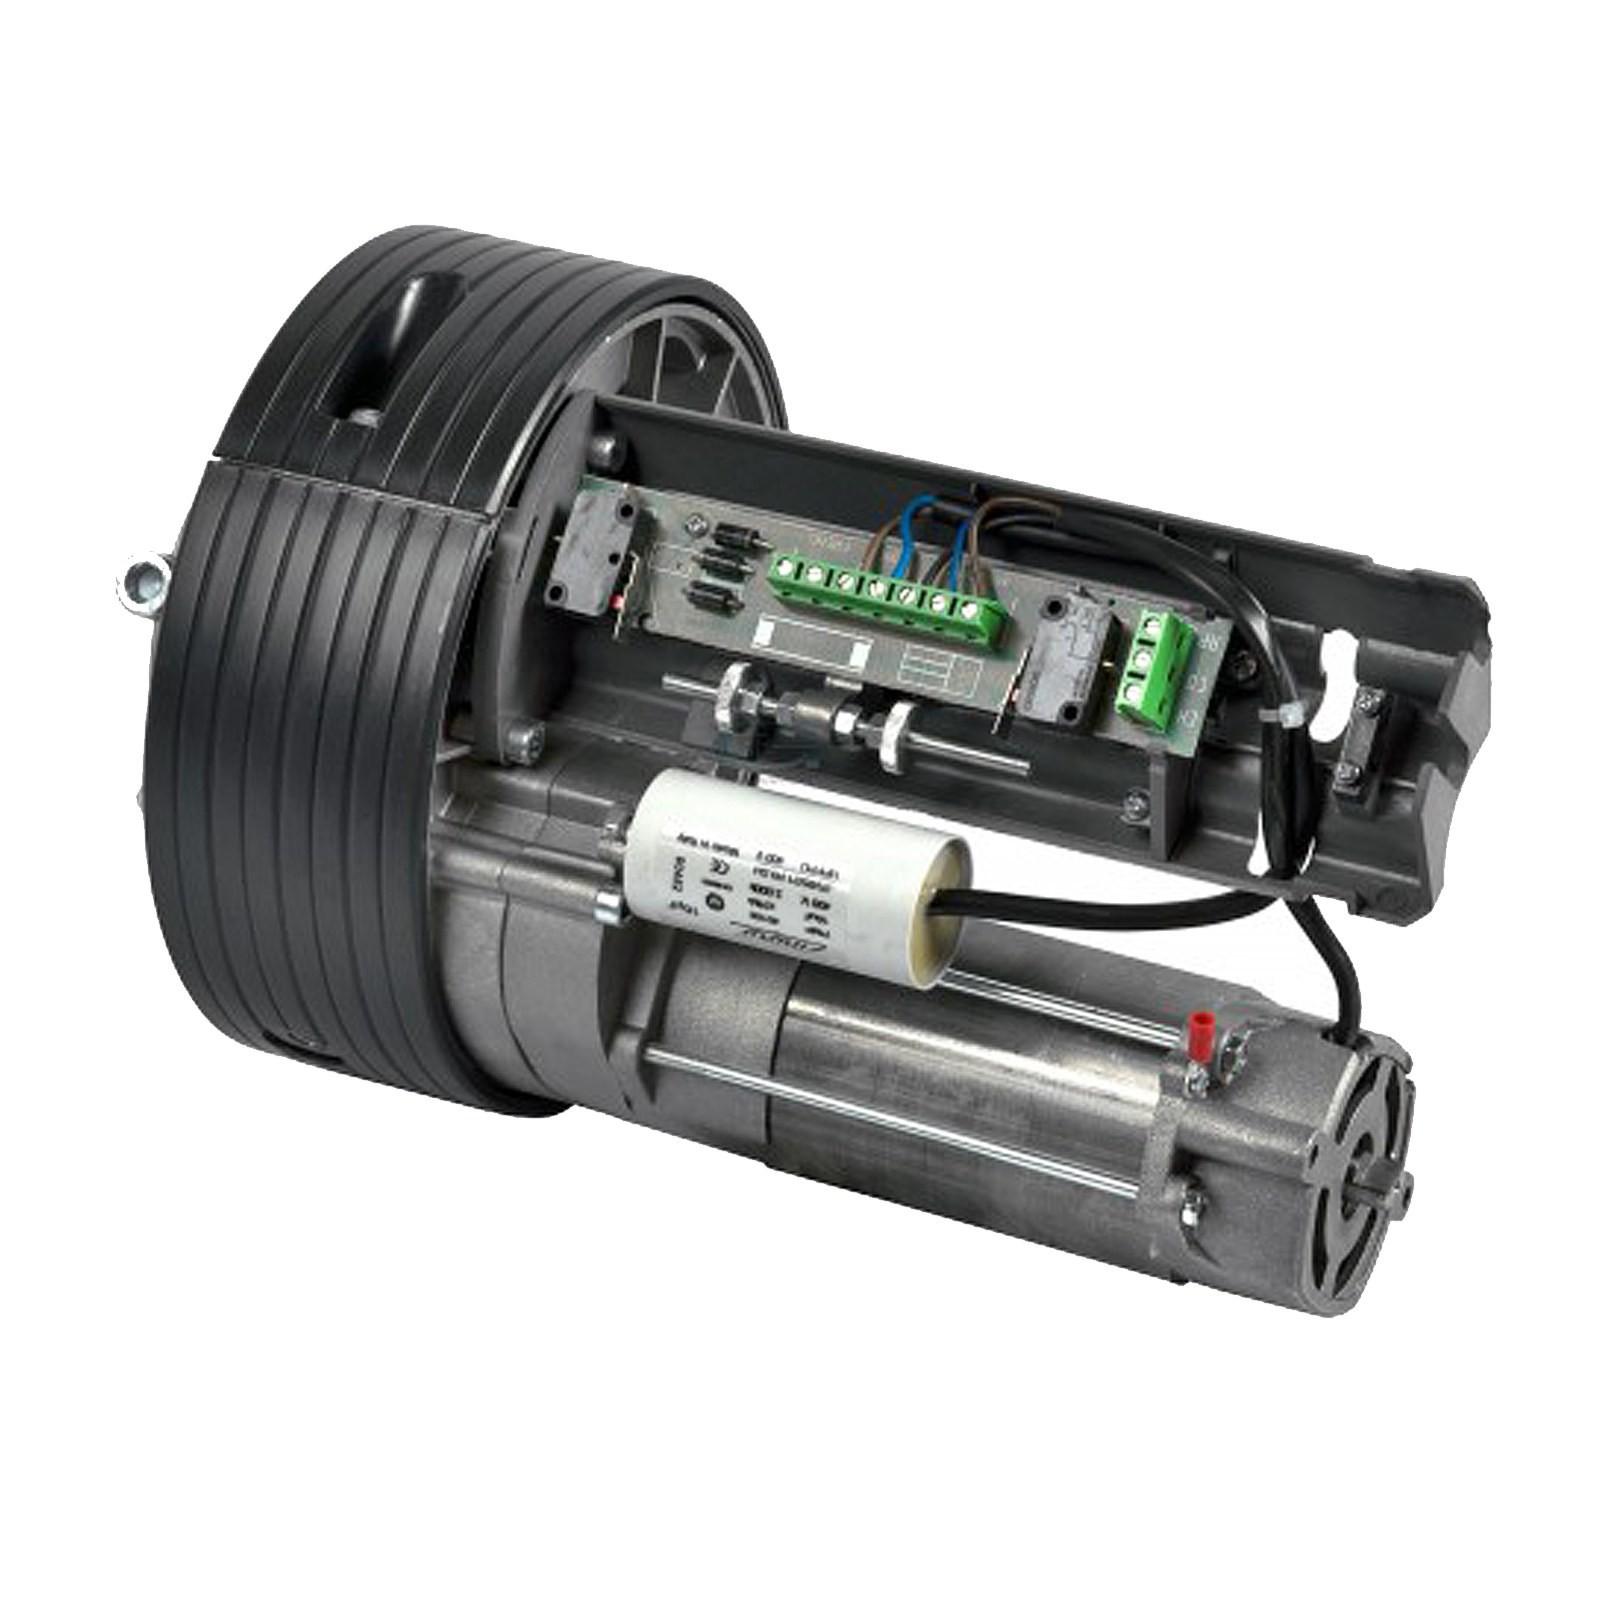 Schema Elettrico Motore Serranda : Motore per serranda avvolgibile saracinesca garage porta